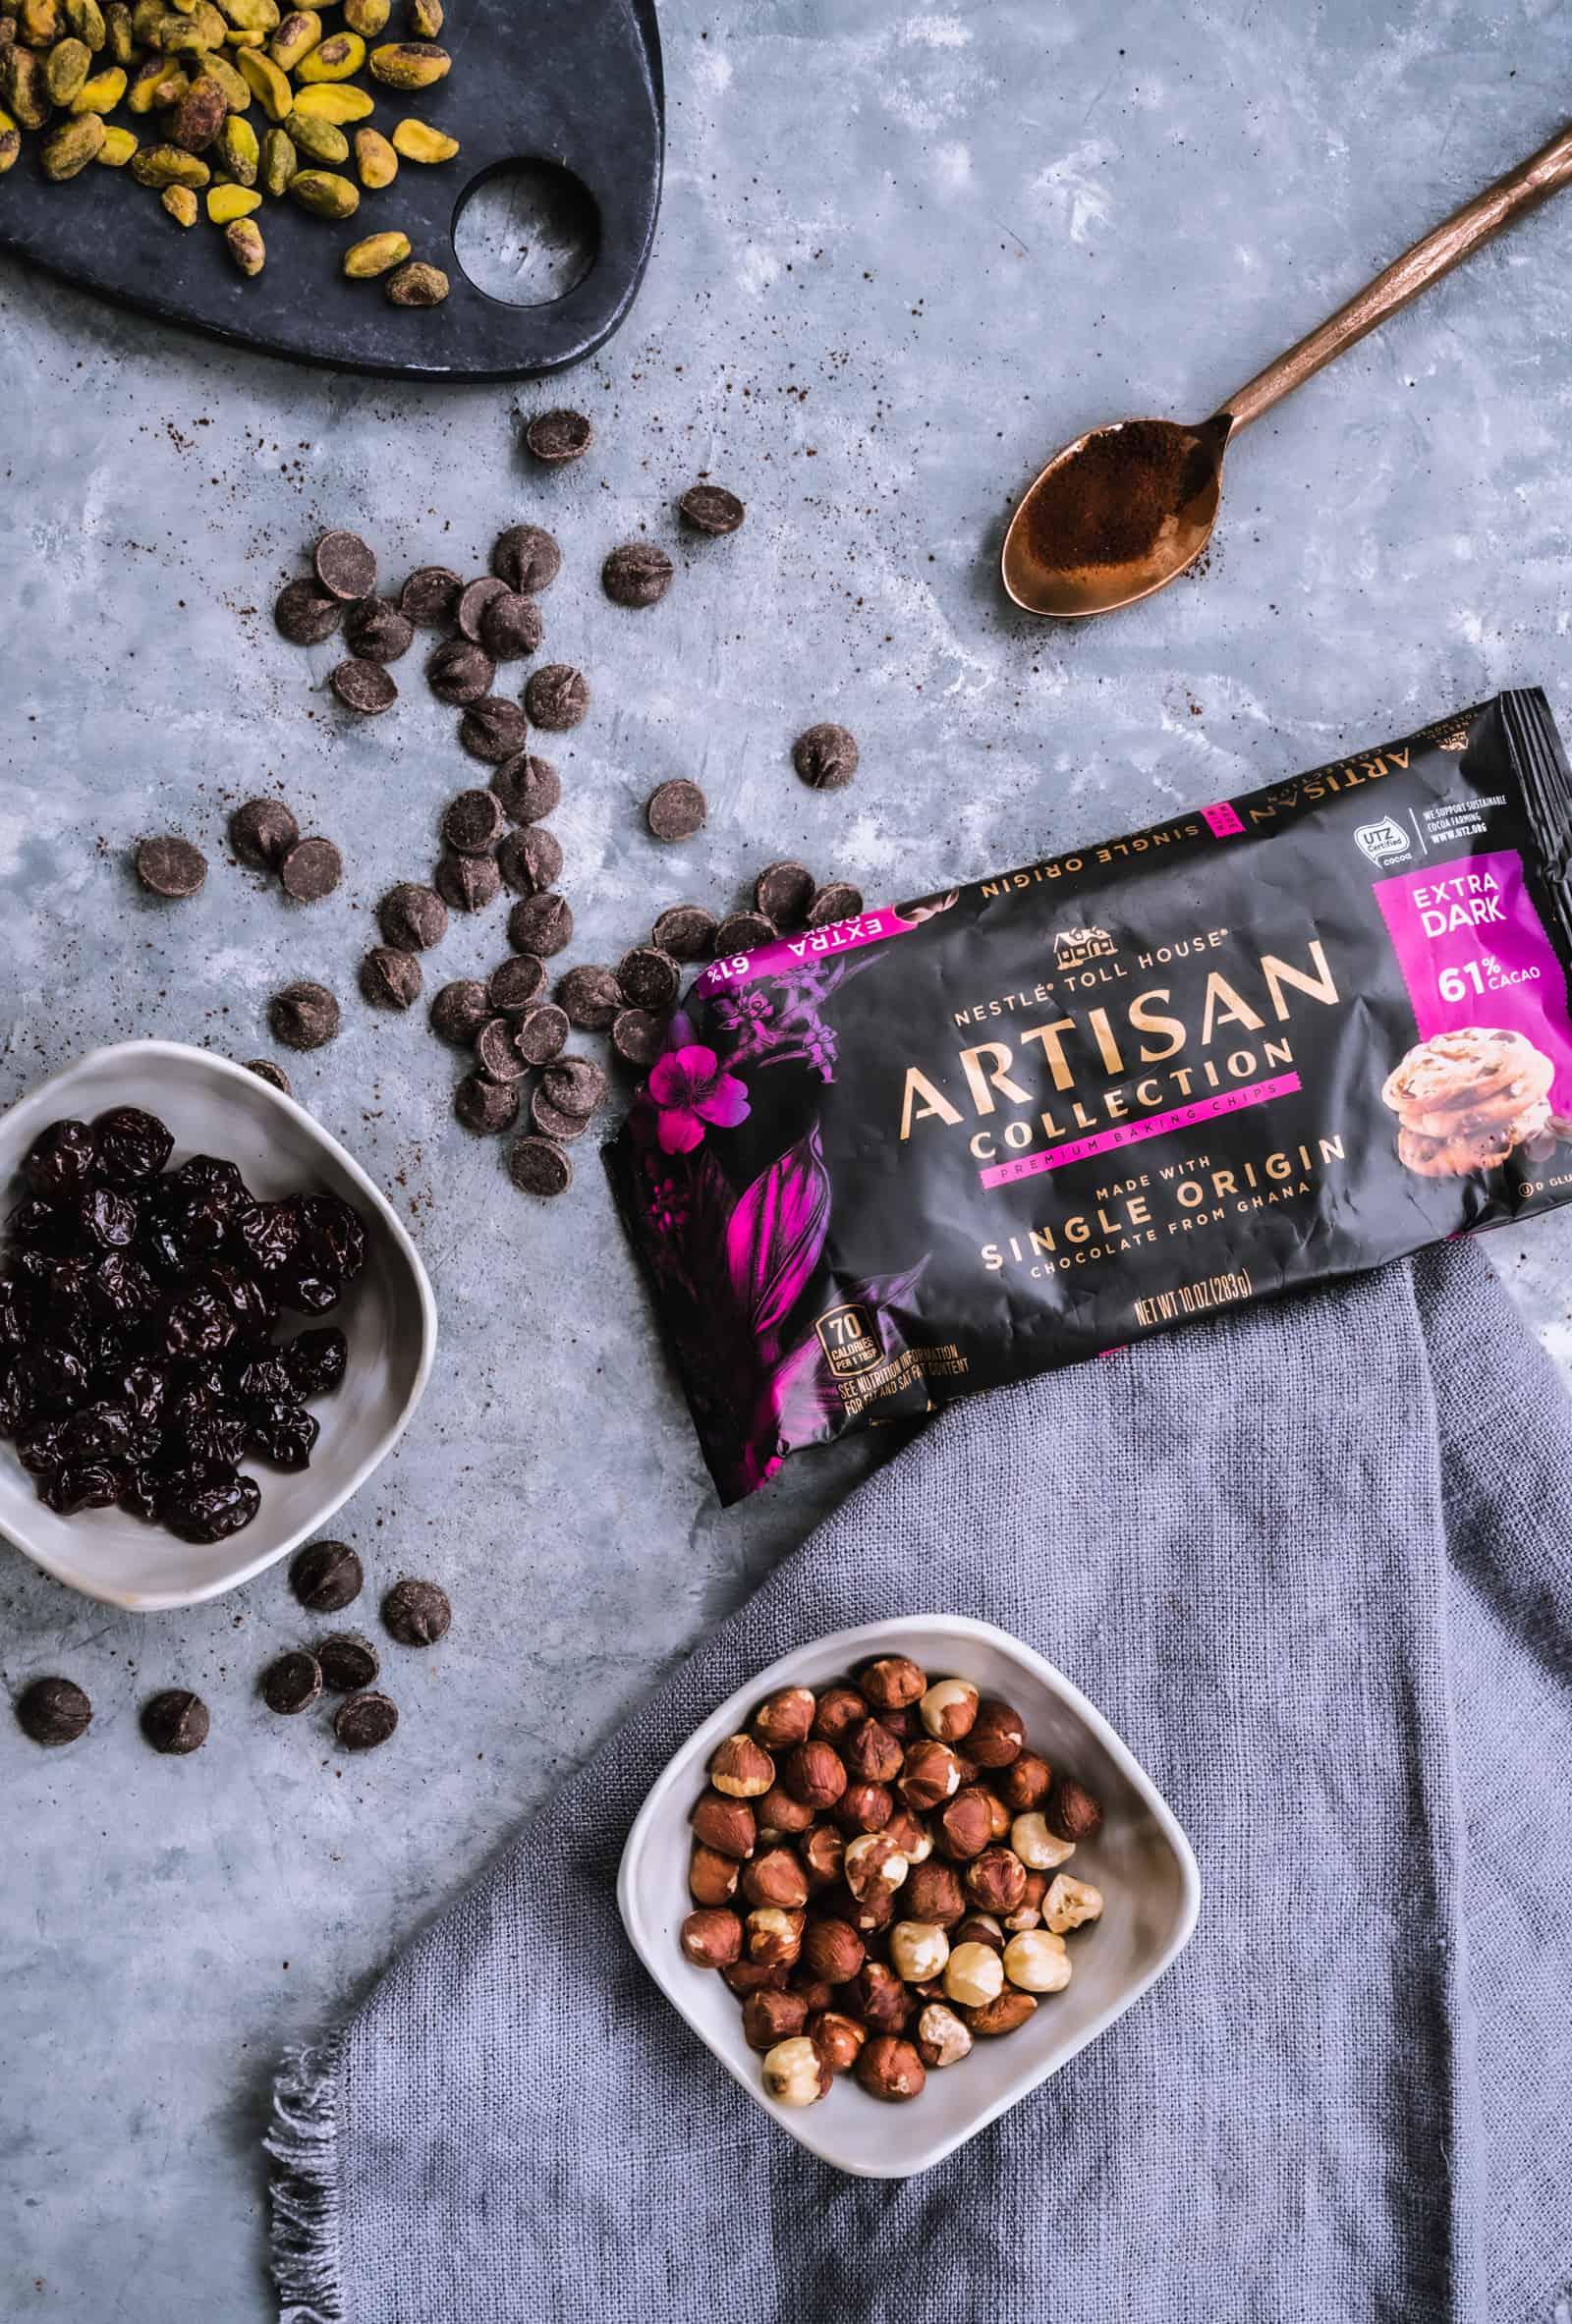 ingredients for dark chocolate bark with dried cherries, hazelnuts, espresso, and pistachios